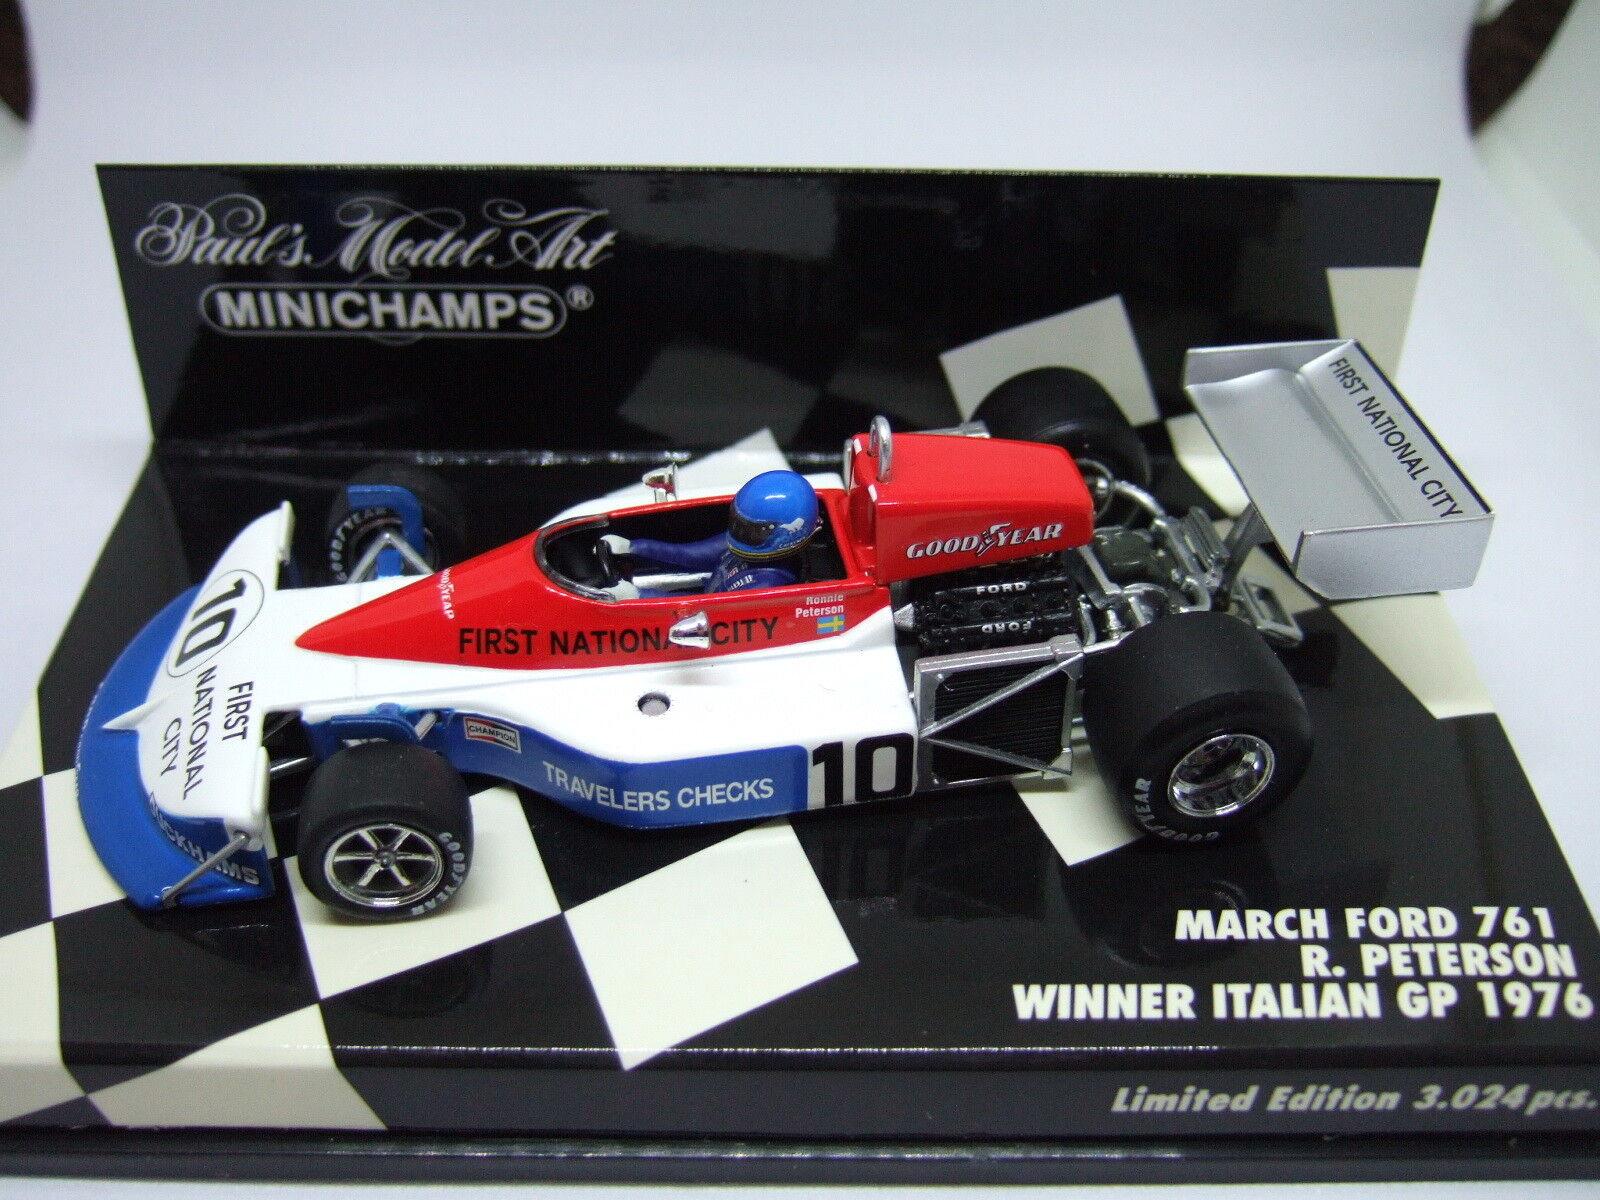 MINICHAMPS Ronnie Peterson March Ford 761 Italian GP Winner 1976 1 43